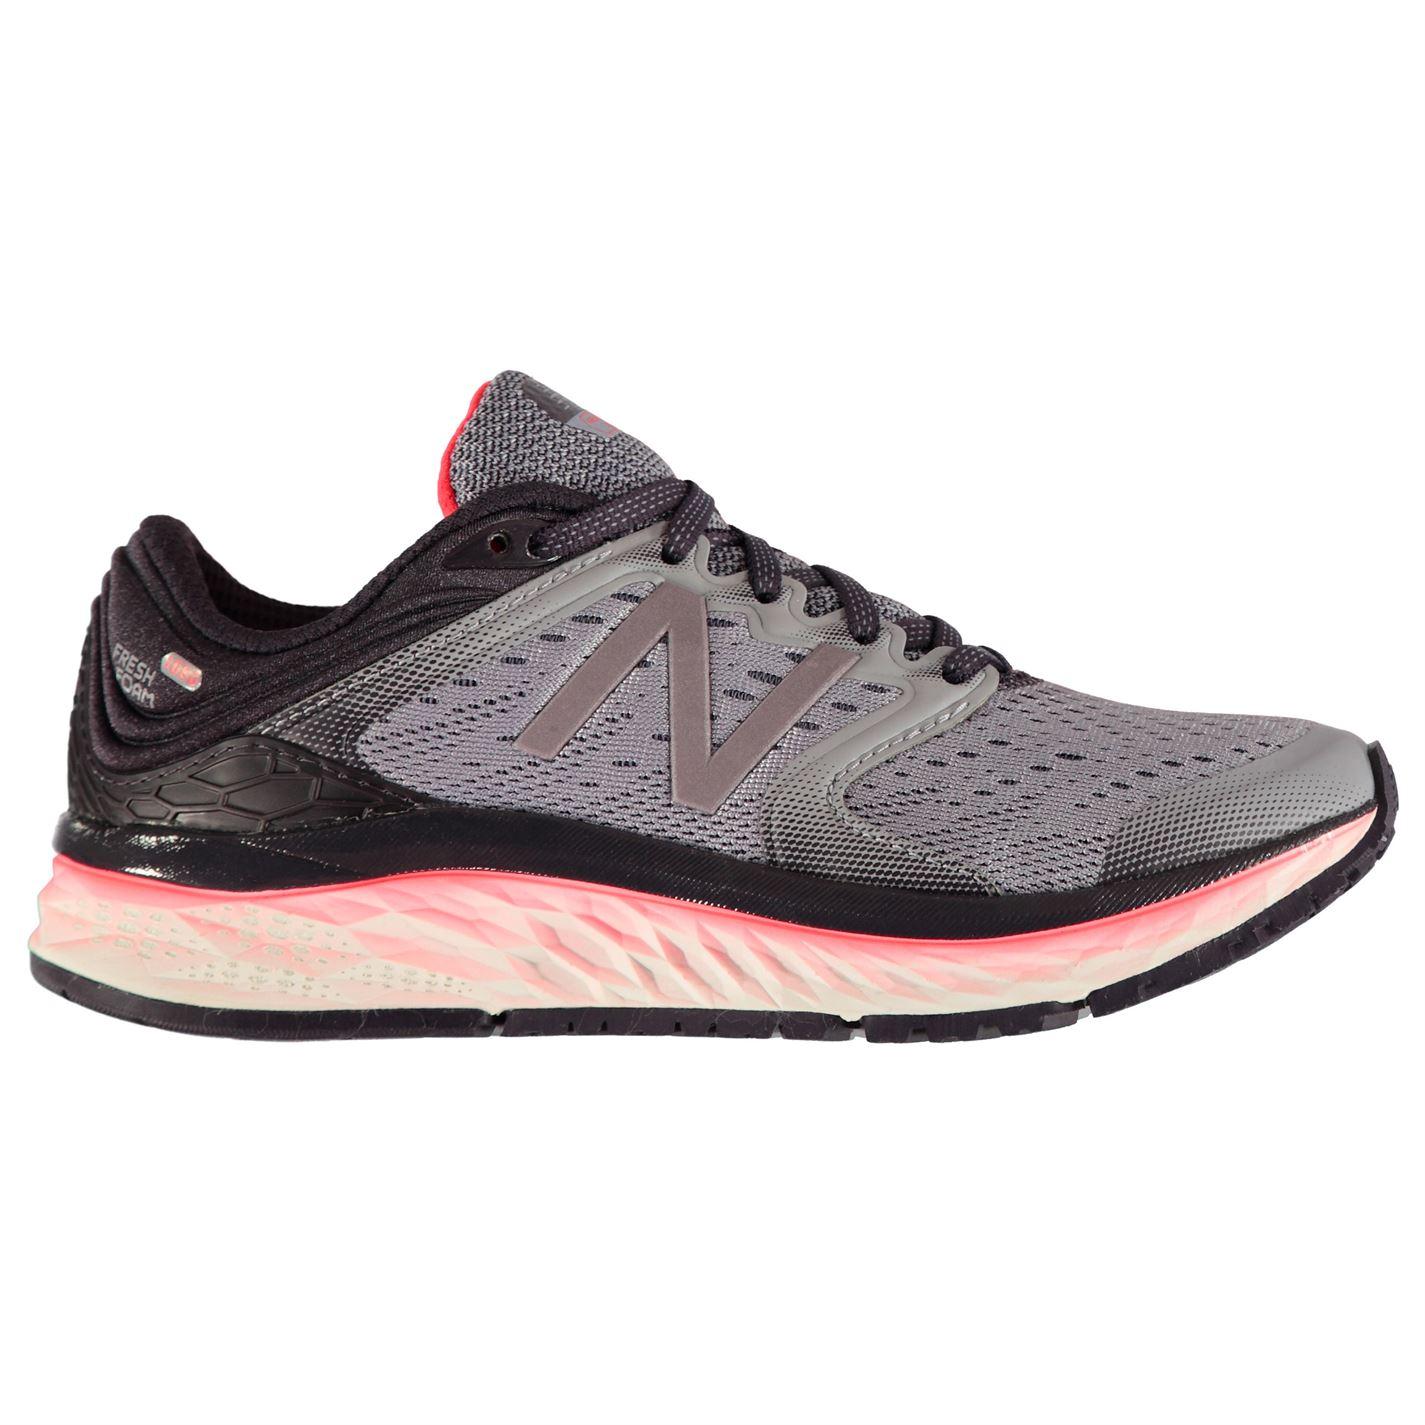 9677d739a79 Details about New Balance Fresh Foam 1080 v8 B Running Shoes Road Womens